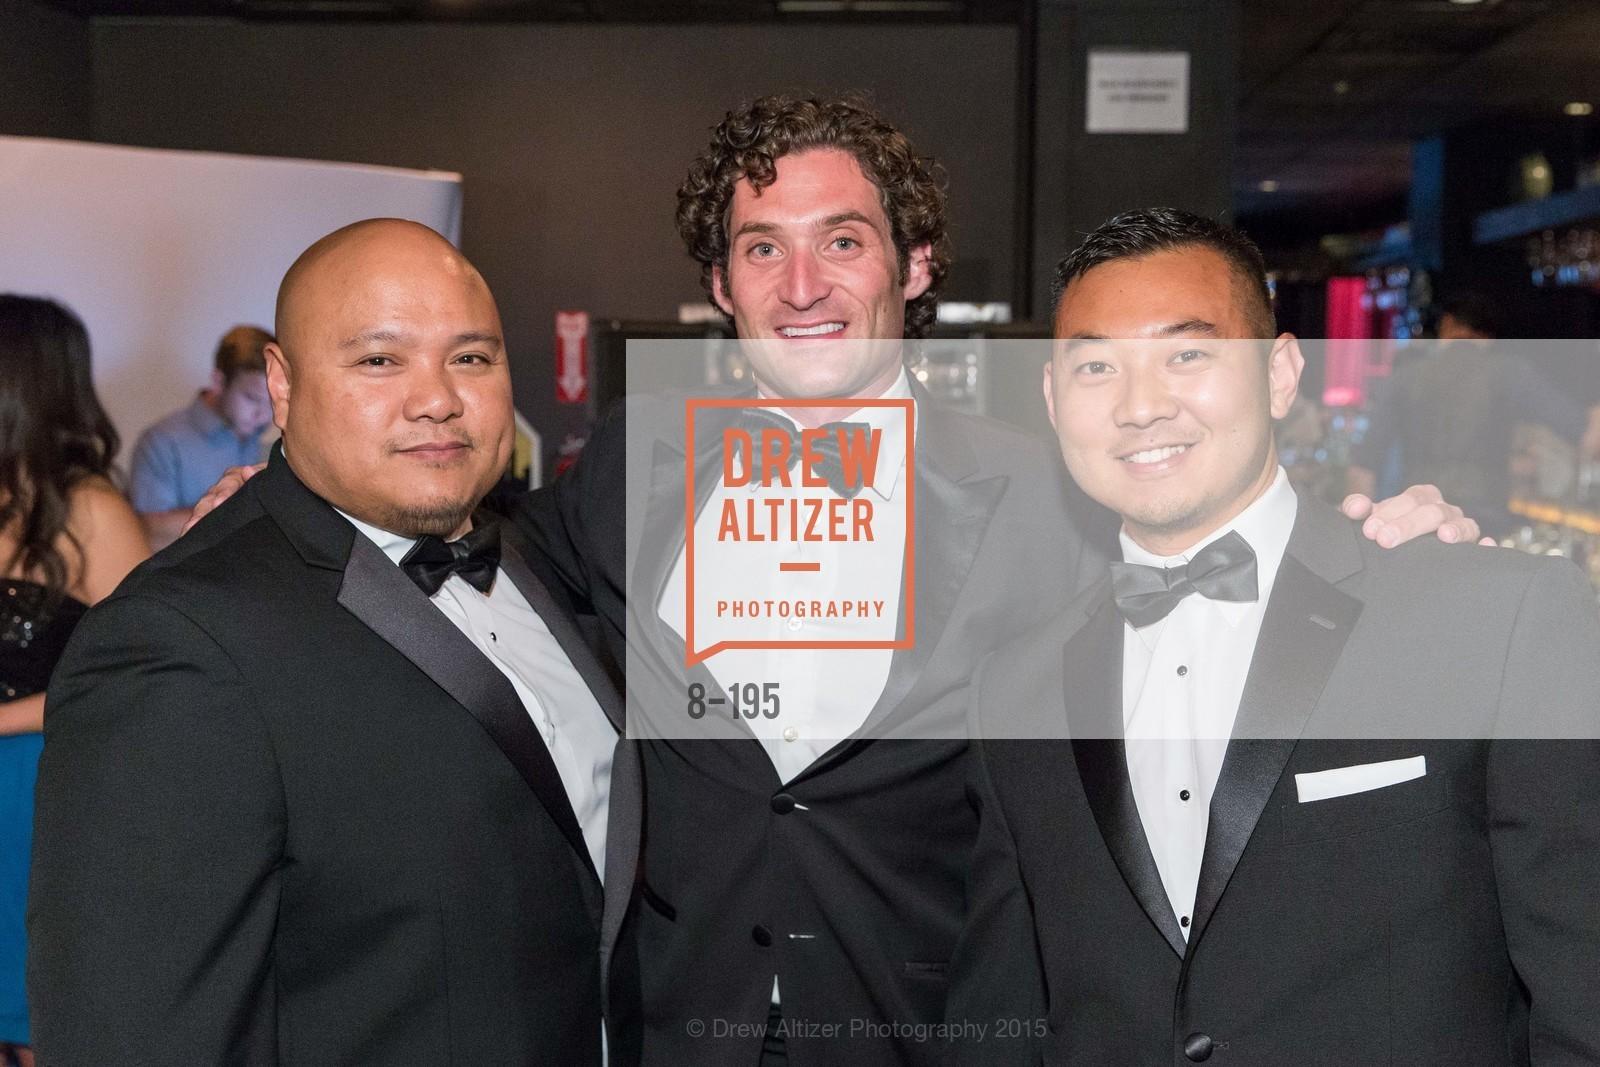 Rogelio Manzana, Justin Fichelson, Eric Li, Photo #8-195